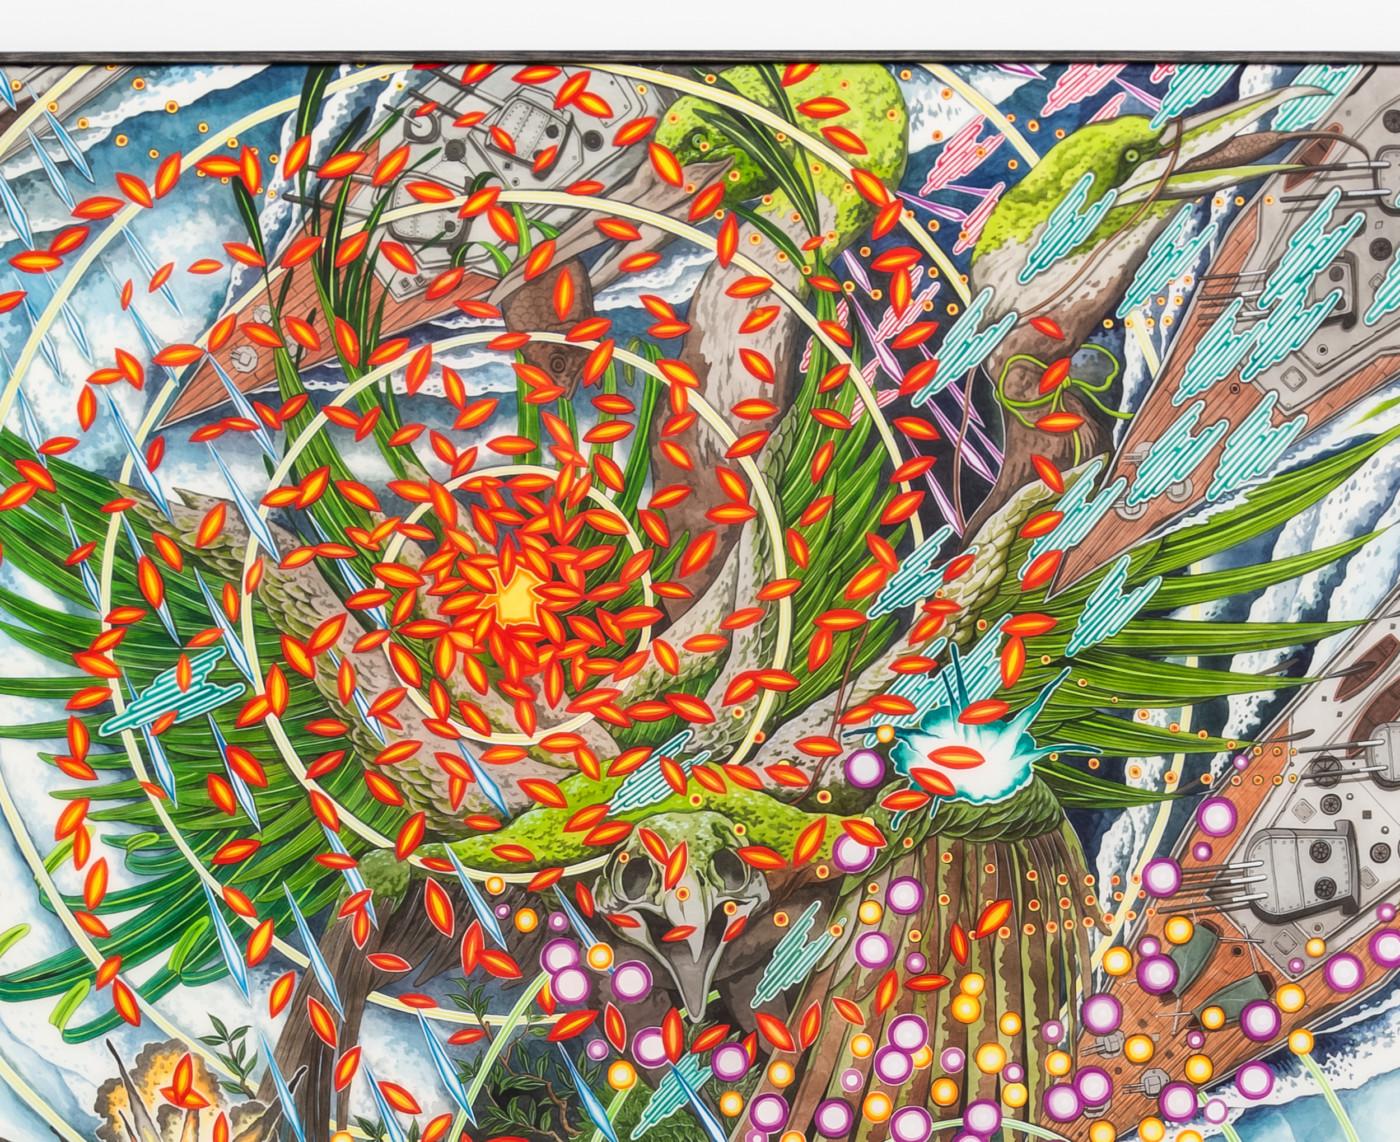 HUN KYU KIM  Last Shelter,  2020 (detail) Pigment painted on silk 136 x 102 cm / 53 1/2 x 40 1/8 in - High Art Gallery Paris